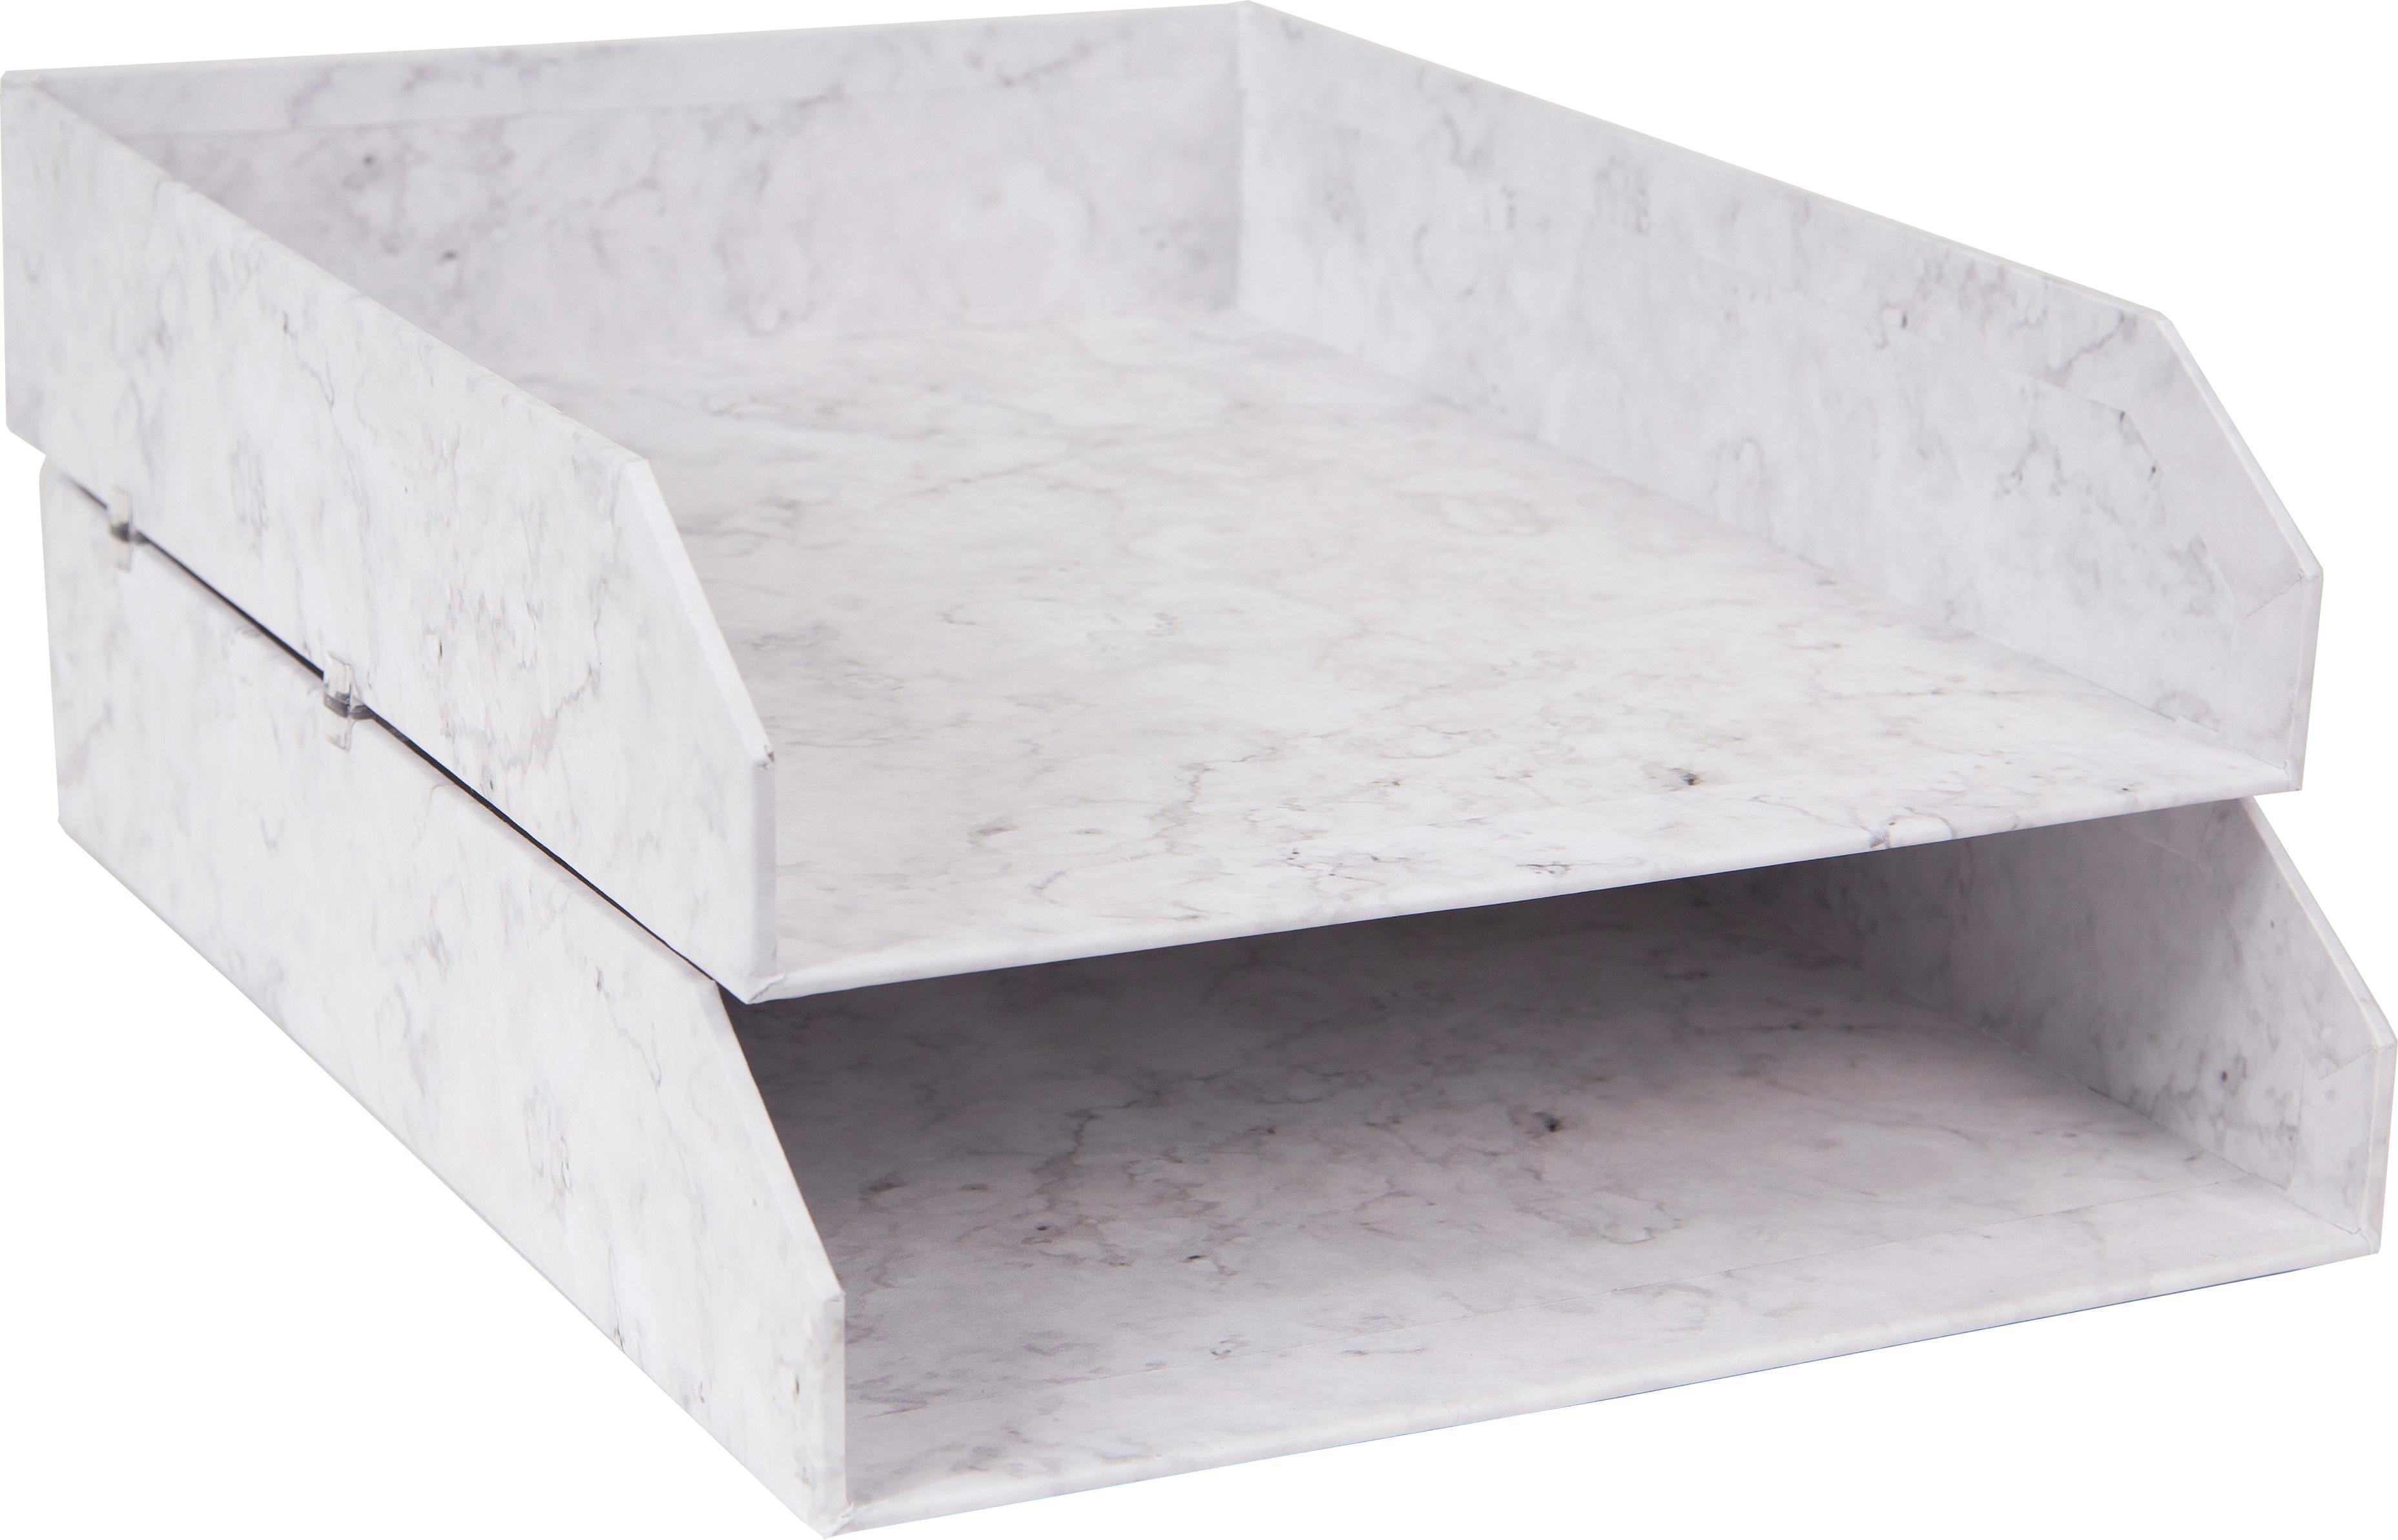 Bandejas para documentos Hakan, 2uds., Cartón laminado macizo, Blanco, An 23 x F 31 cm